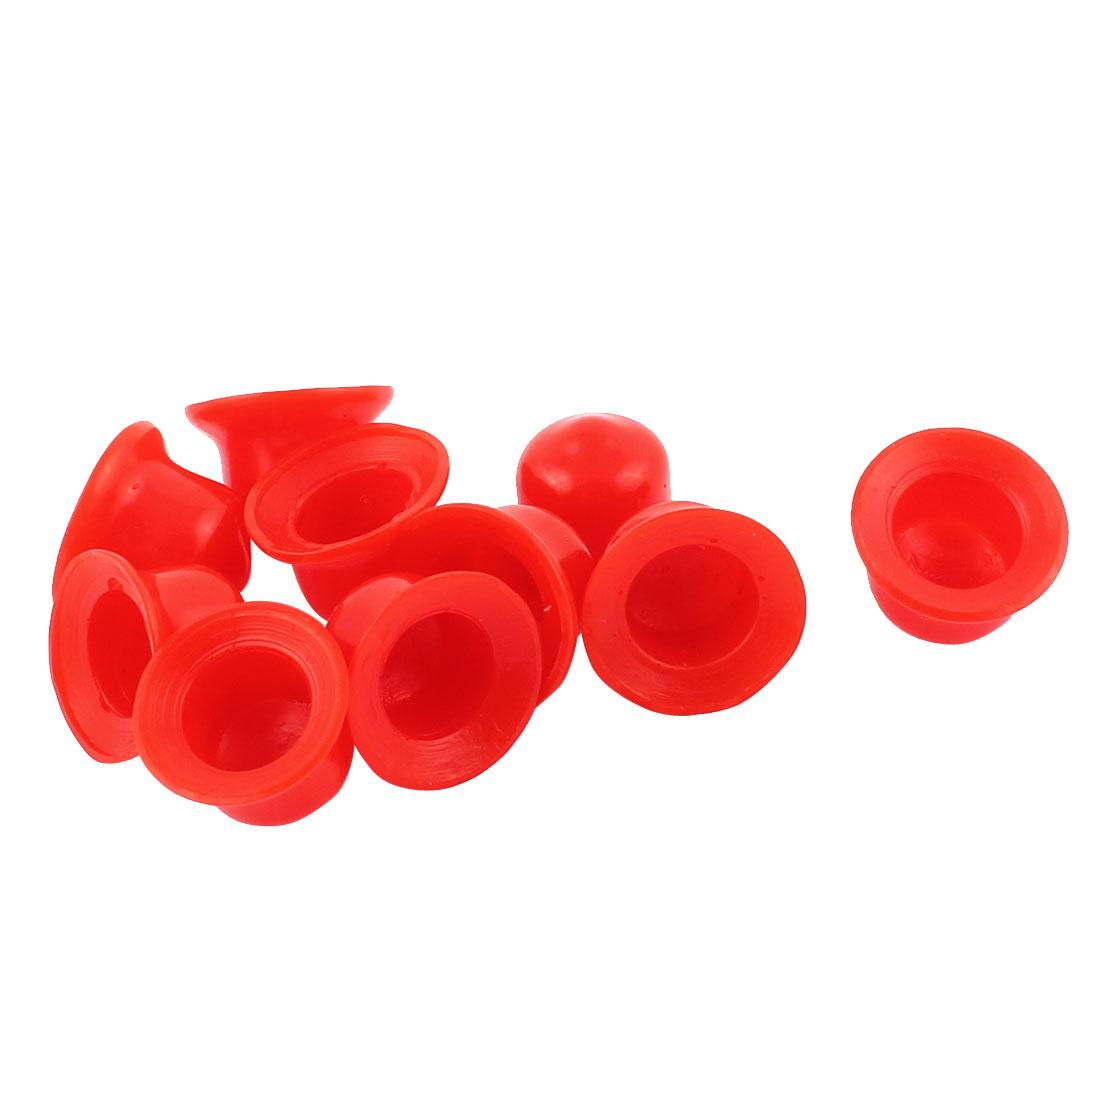 10 Pcs Red PVC End Cap Round 14mm Tubing Dustproof Tube Inserts